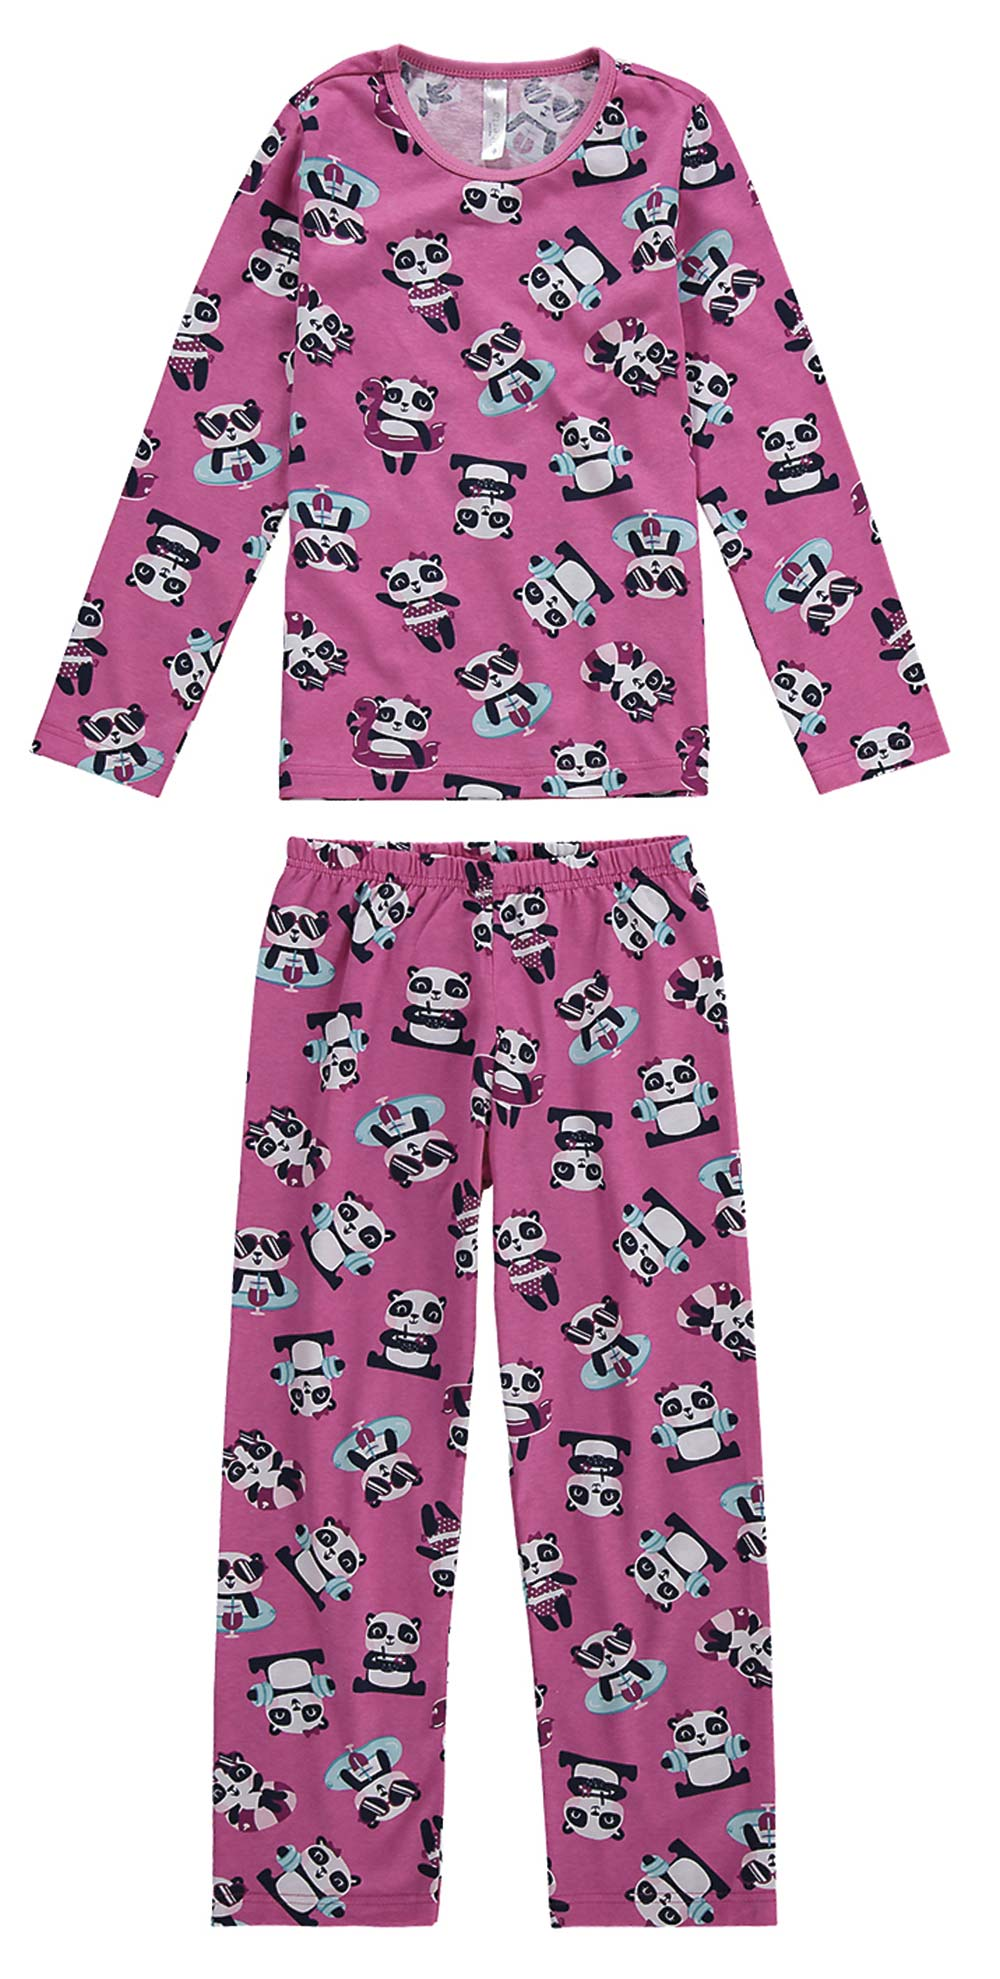 Pijama Infantil Feminino  Inverno Rosa Panda Summer  Malwee